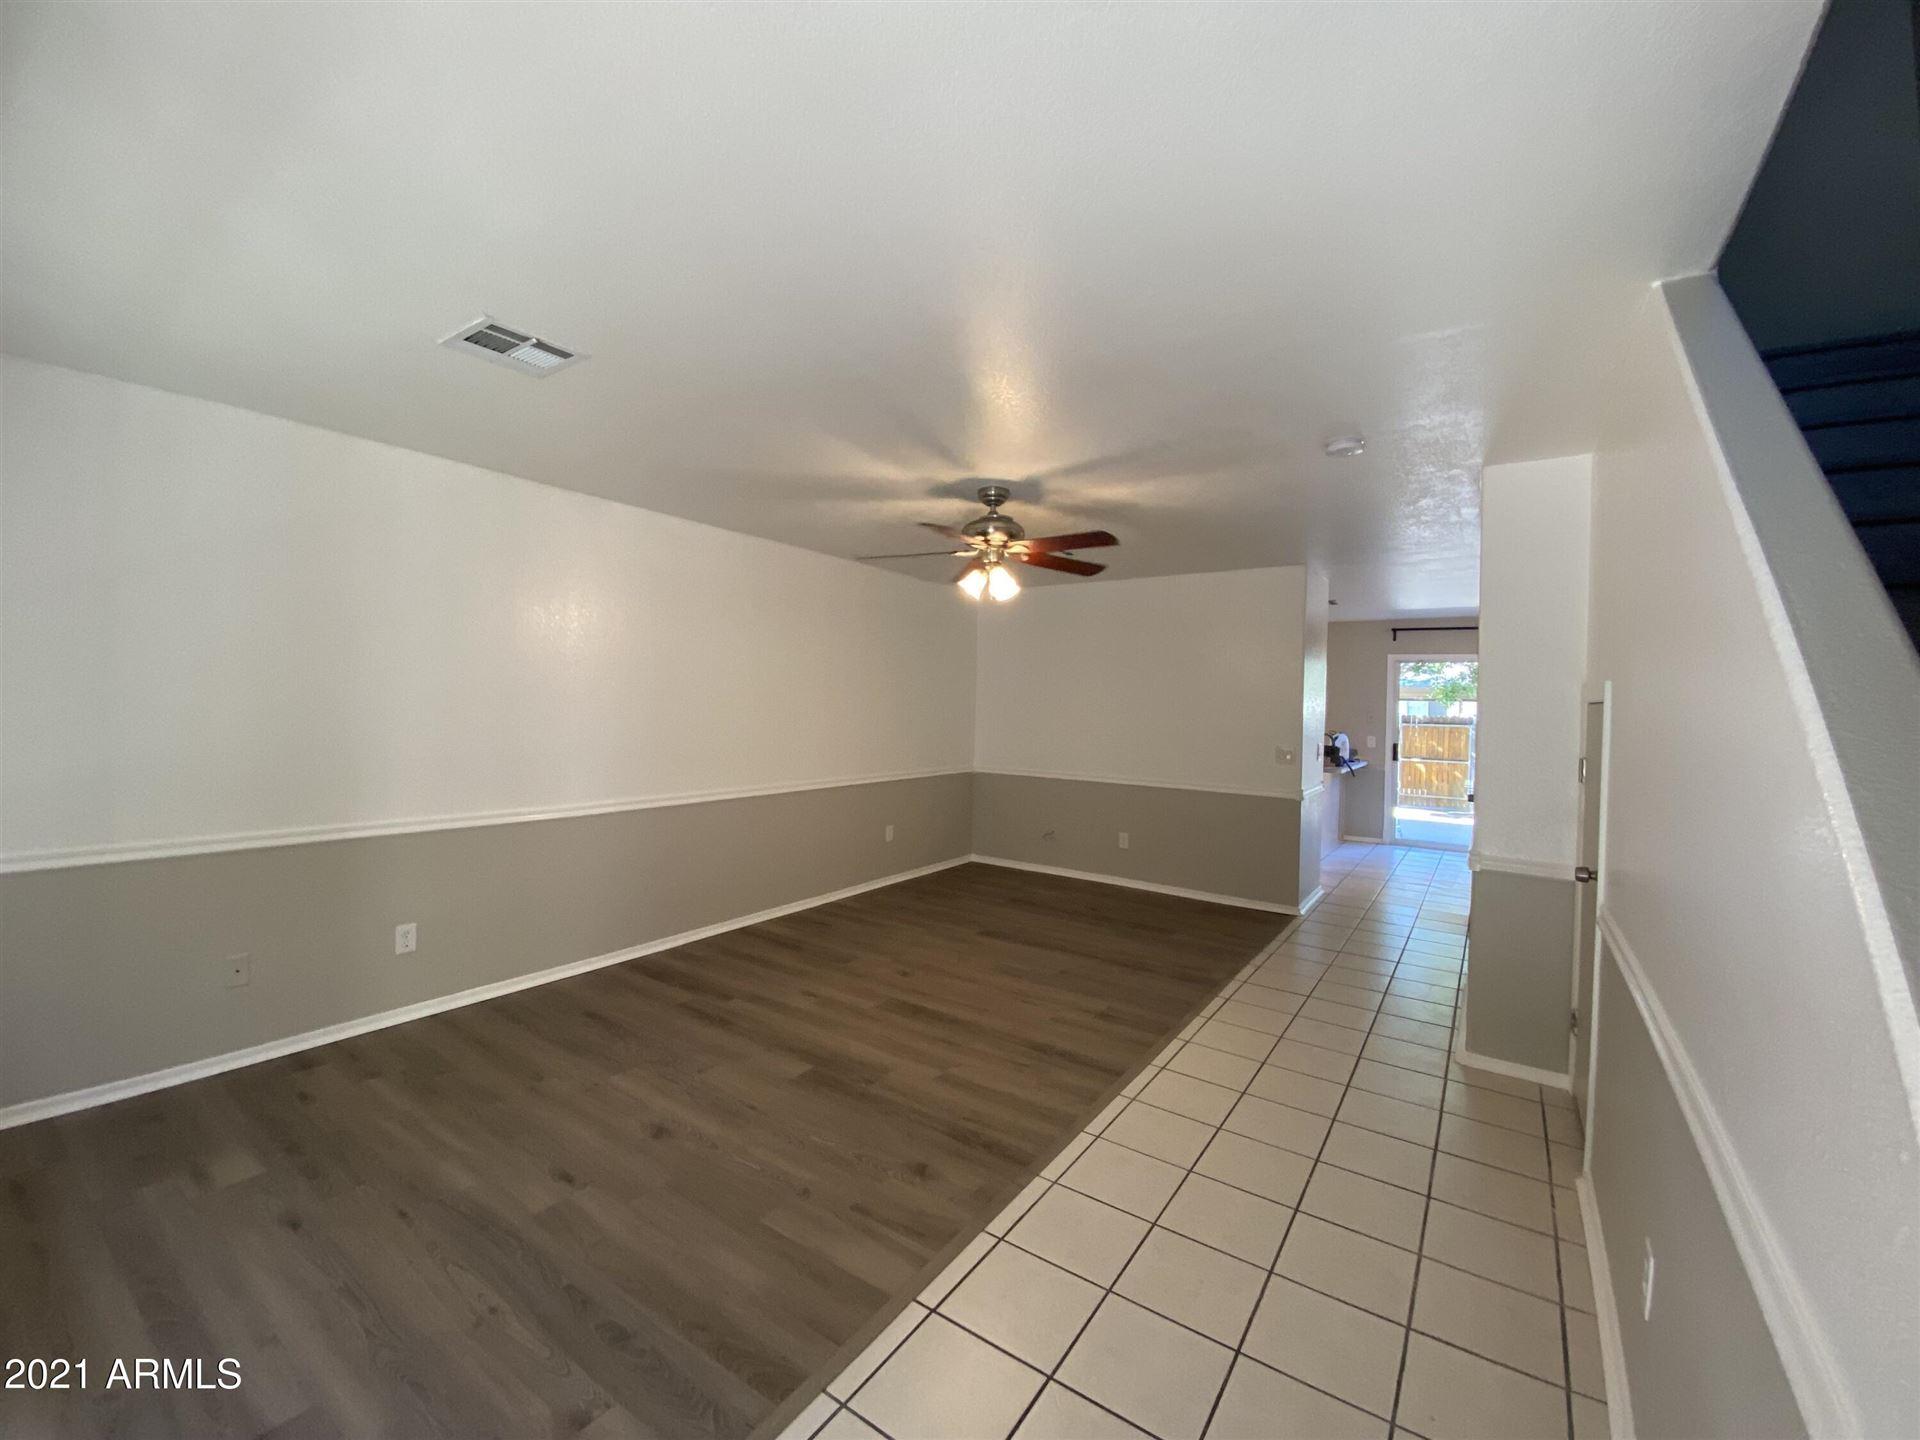 Photo of 10101 N 91ST Avenue #118, Peoria, AZ 85345 (MLS # 6296699)